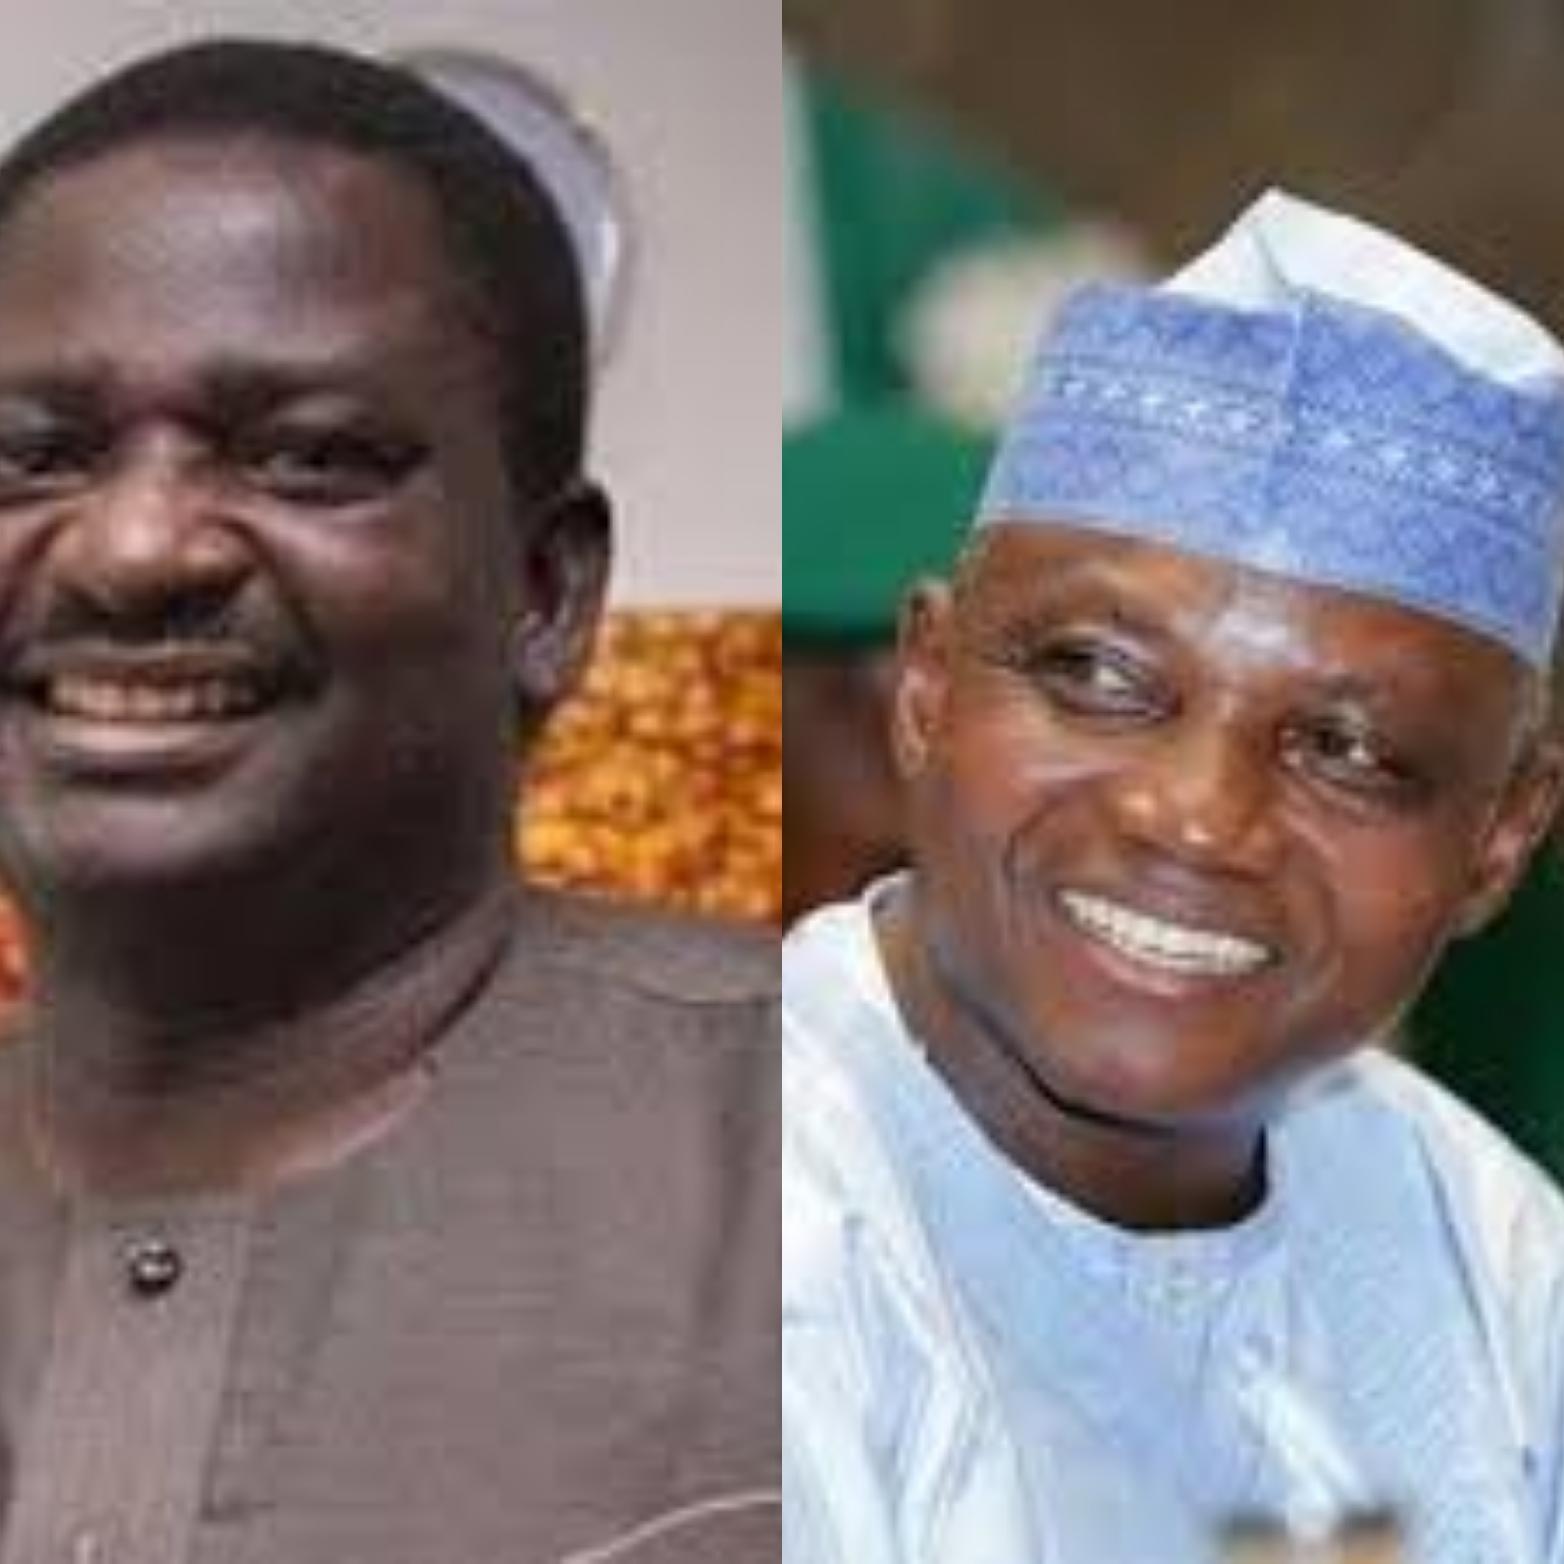 IMG 20190821 191735 - Buhari Re-appoints Garba Shehu, Femi Adesina As Spokesperson